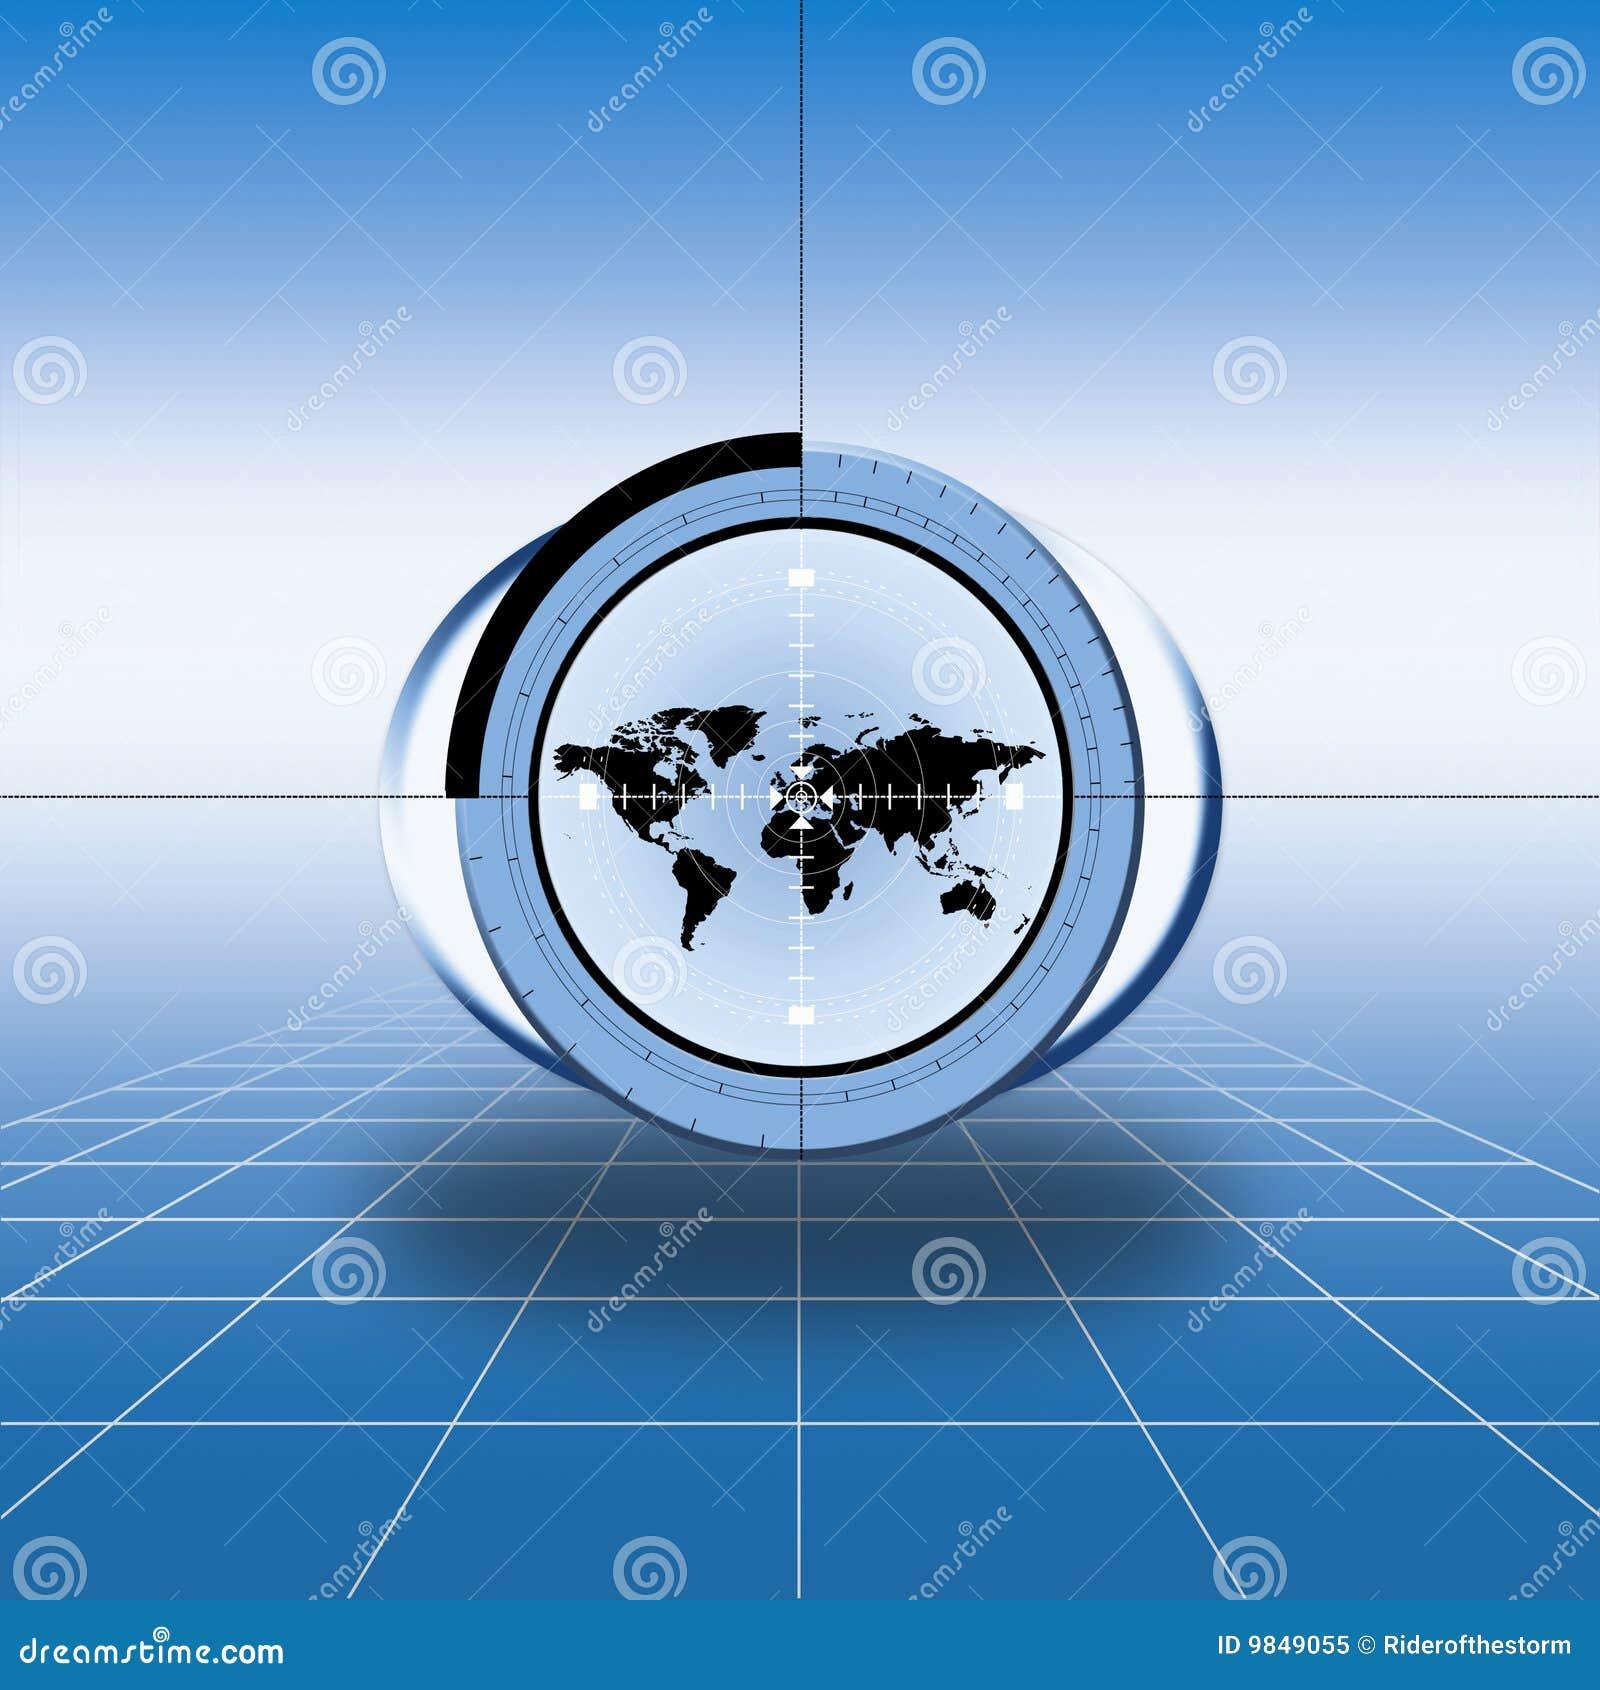 World Map Target Timekeeperwatches